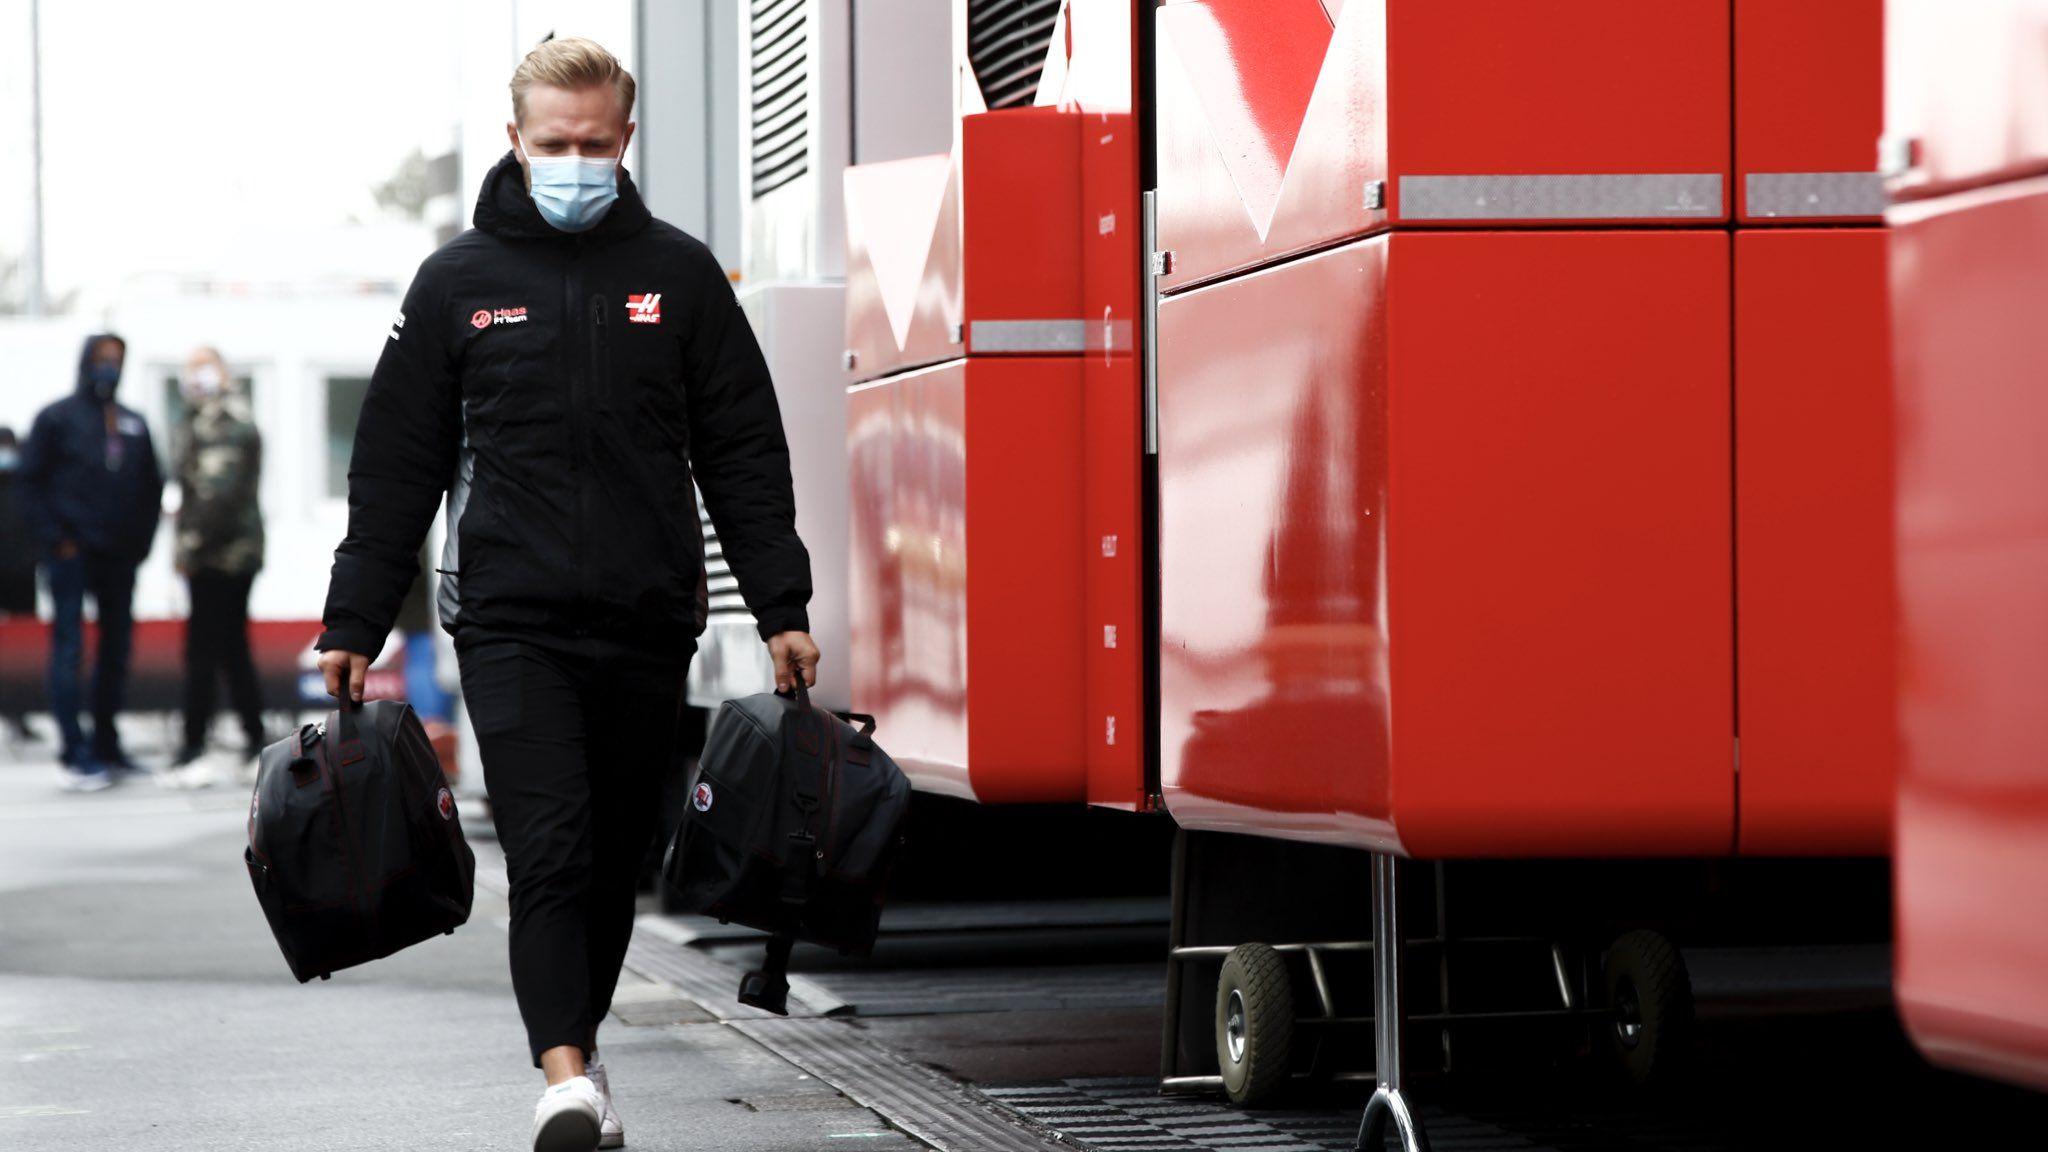 Kevin Magnussen, Haas F1 Team, F1 2020